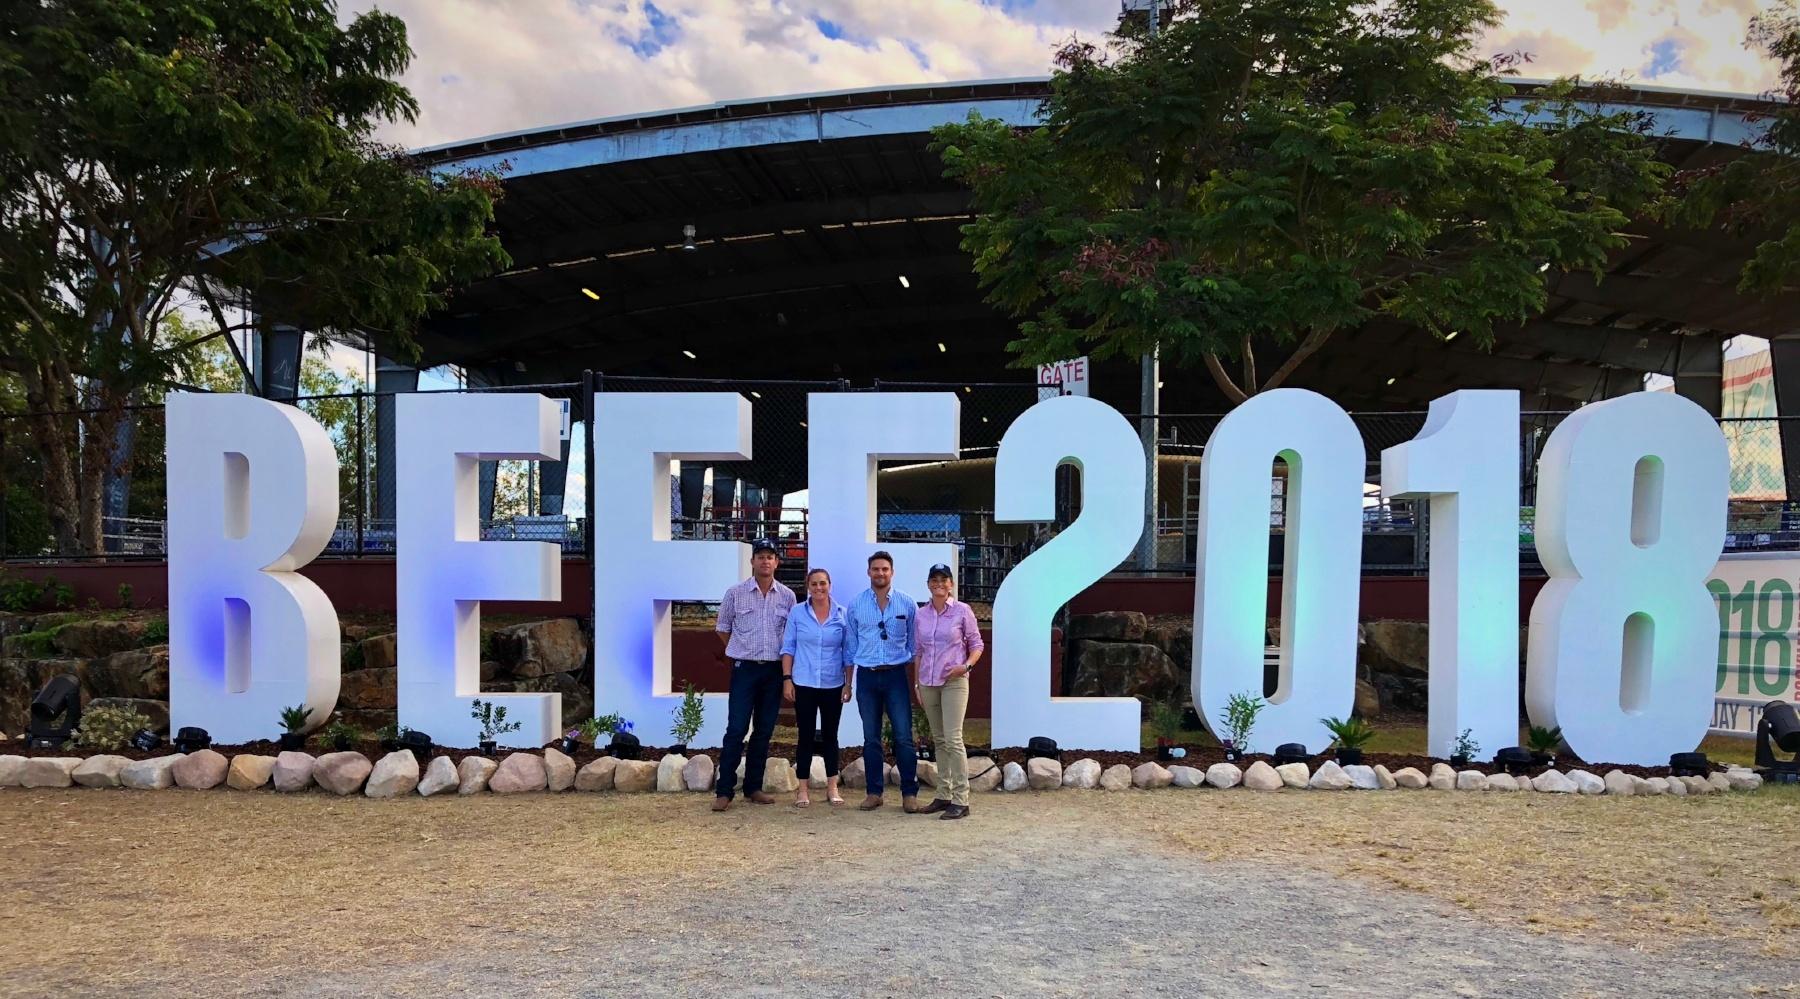 Beef Australia, Princess Royal Station 2018-270165-edited